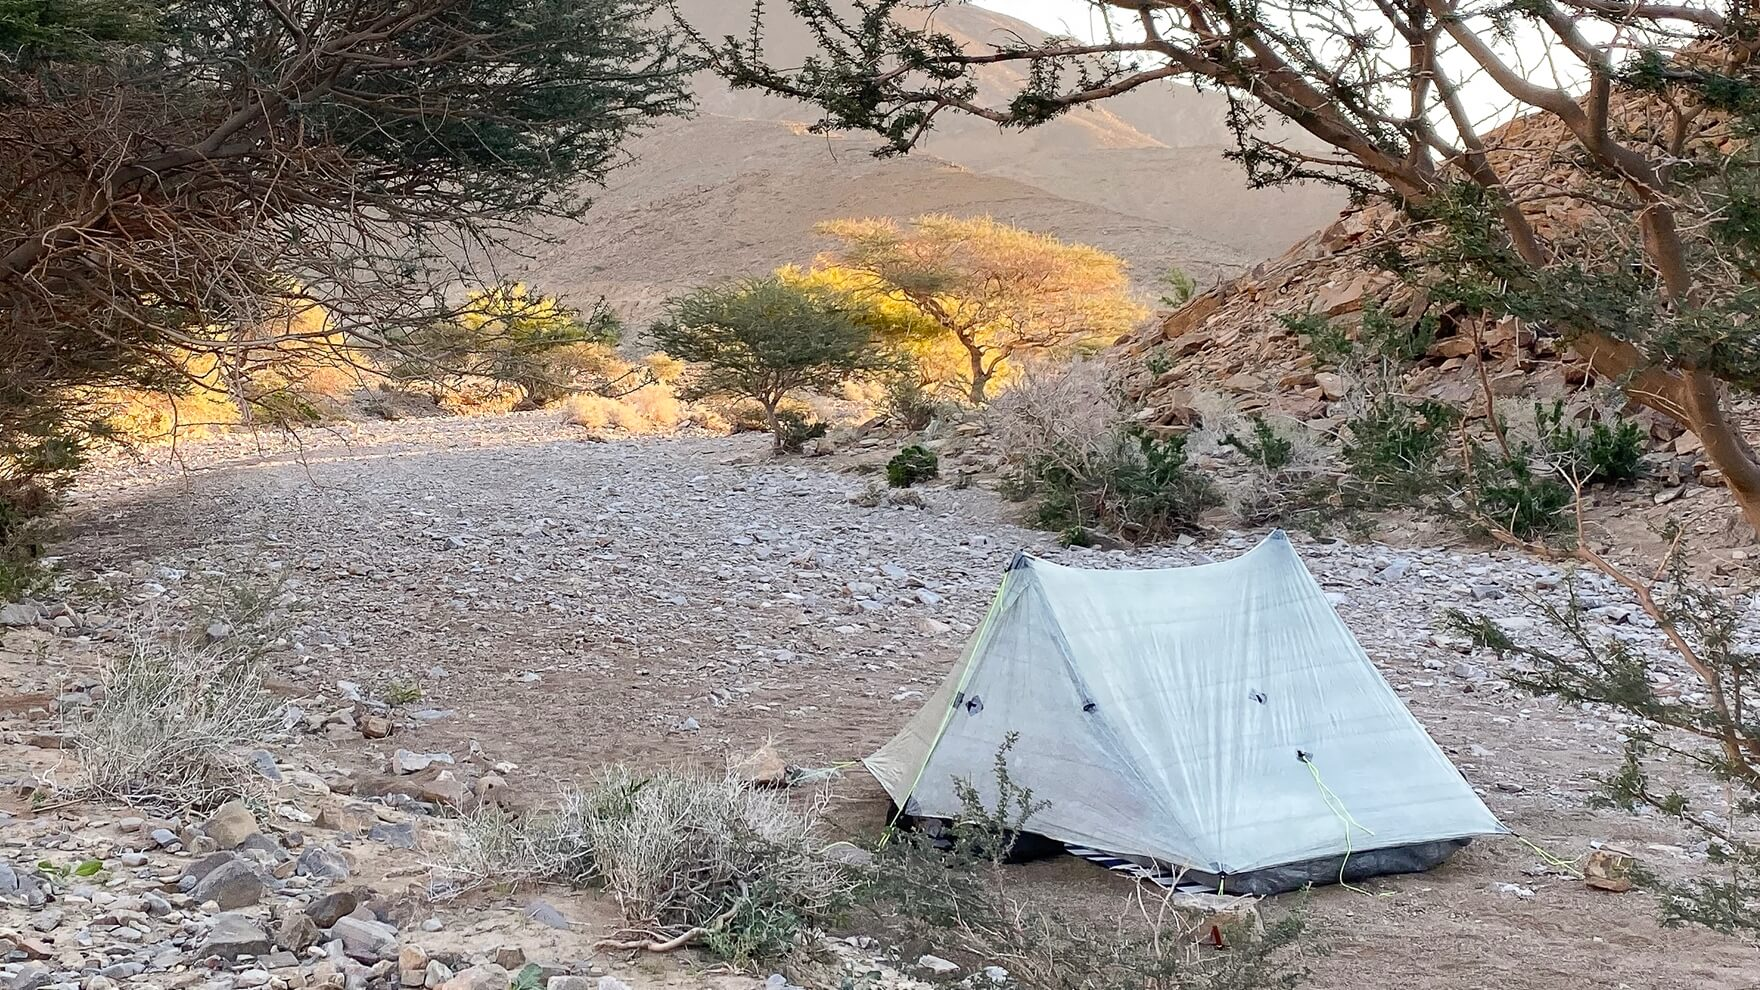 Review:ZPacks Duplex Tent 2人用ながら驚異の550g! 超軽量・コンパクト・堅牢さを兼ね備えたウルトラライト・テントの傑作